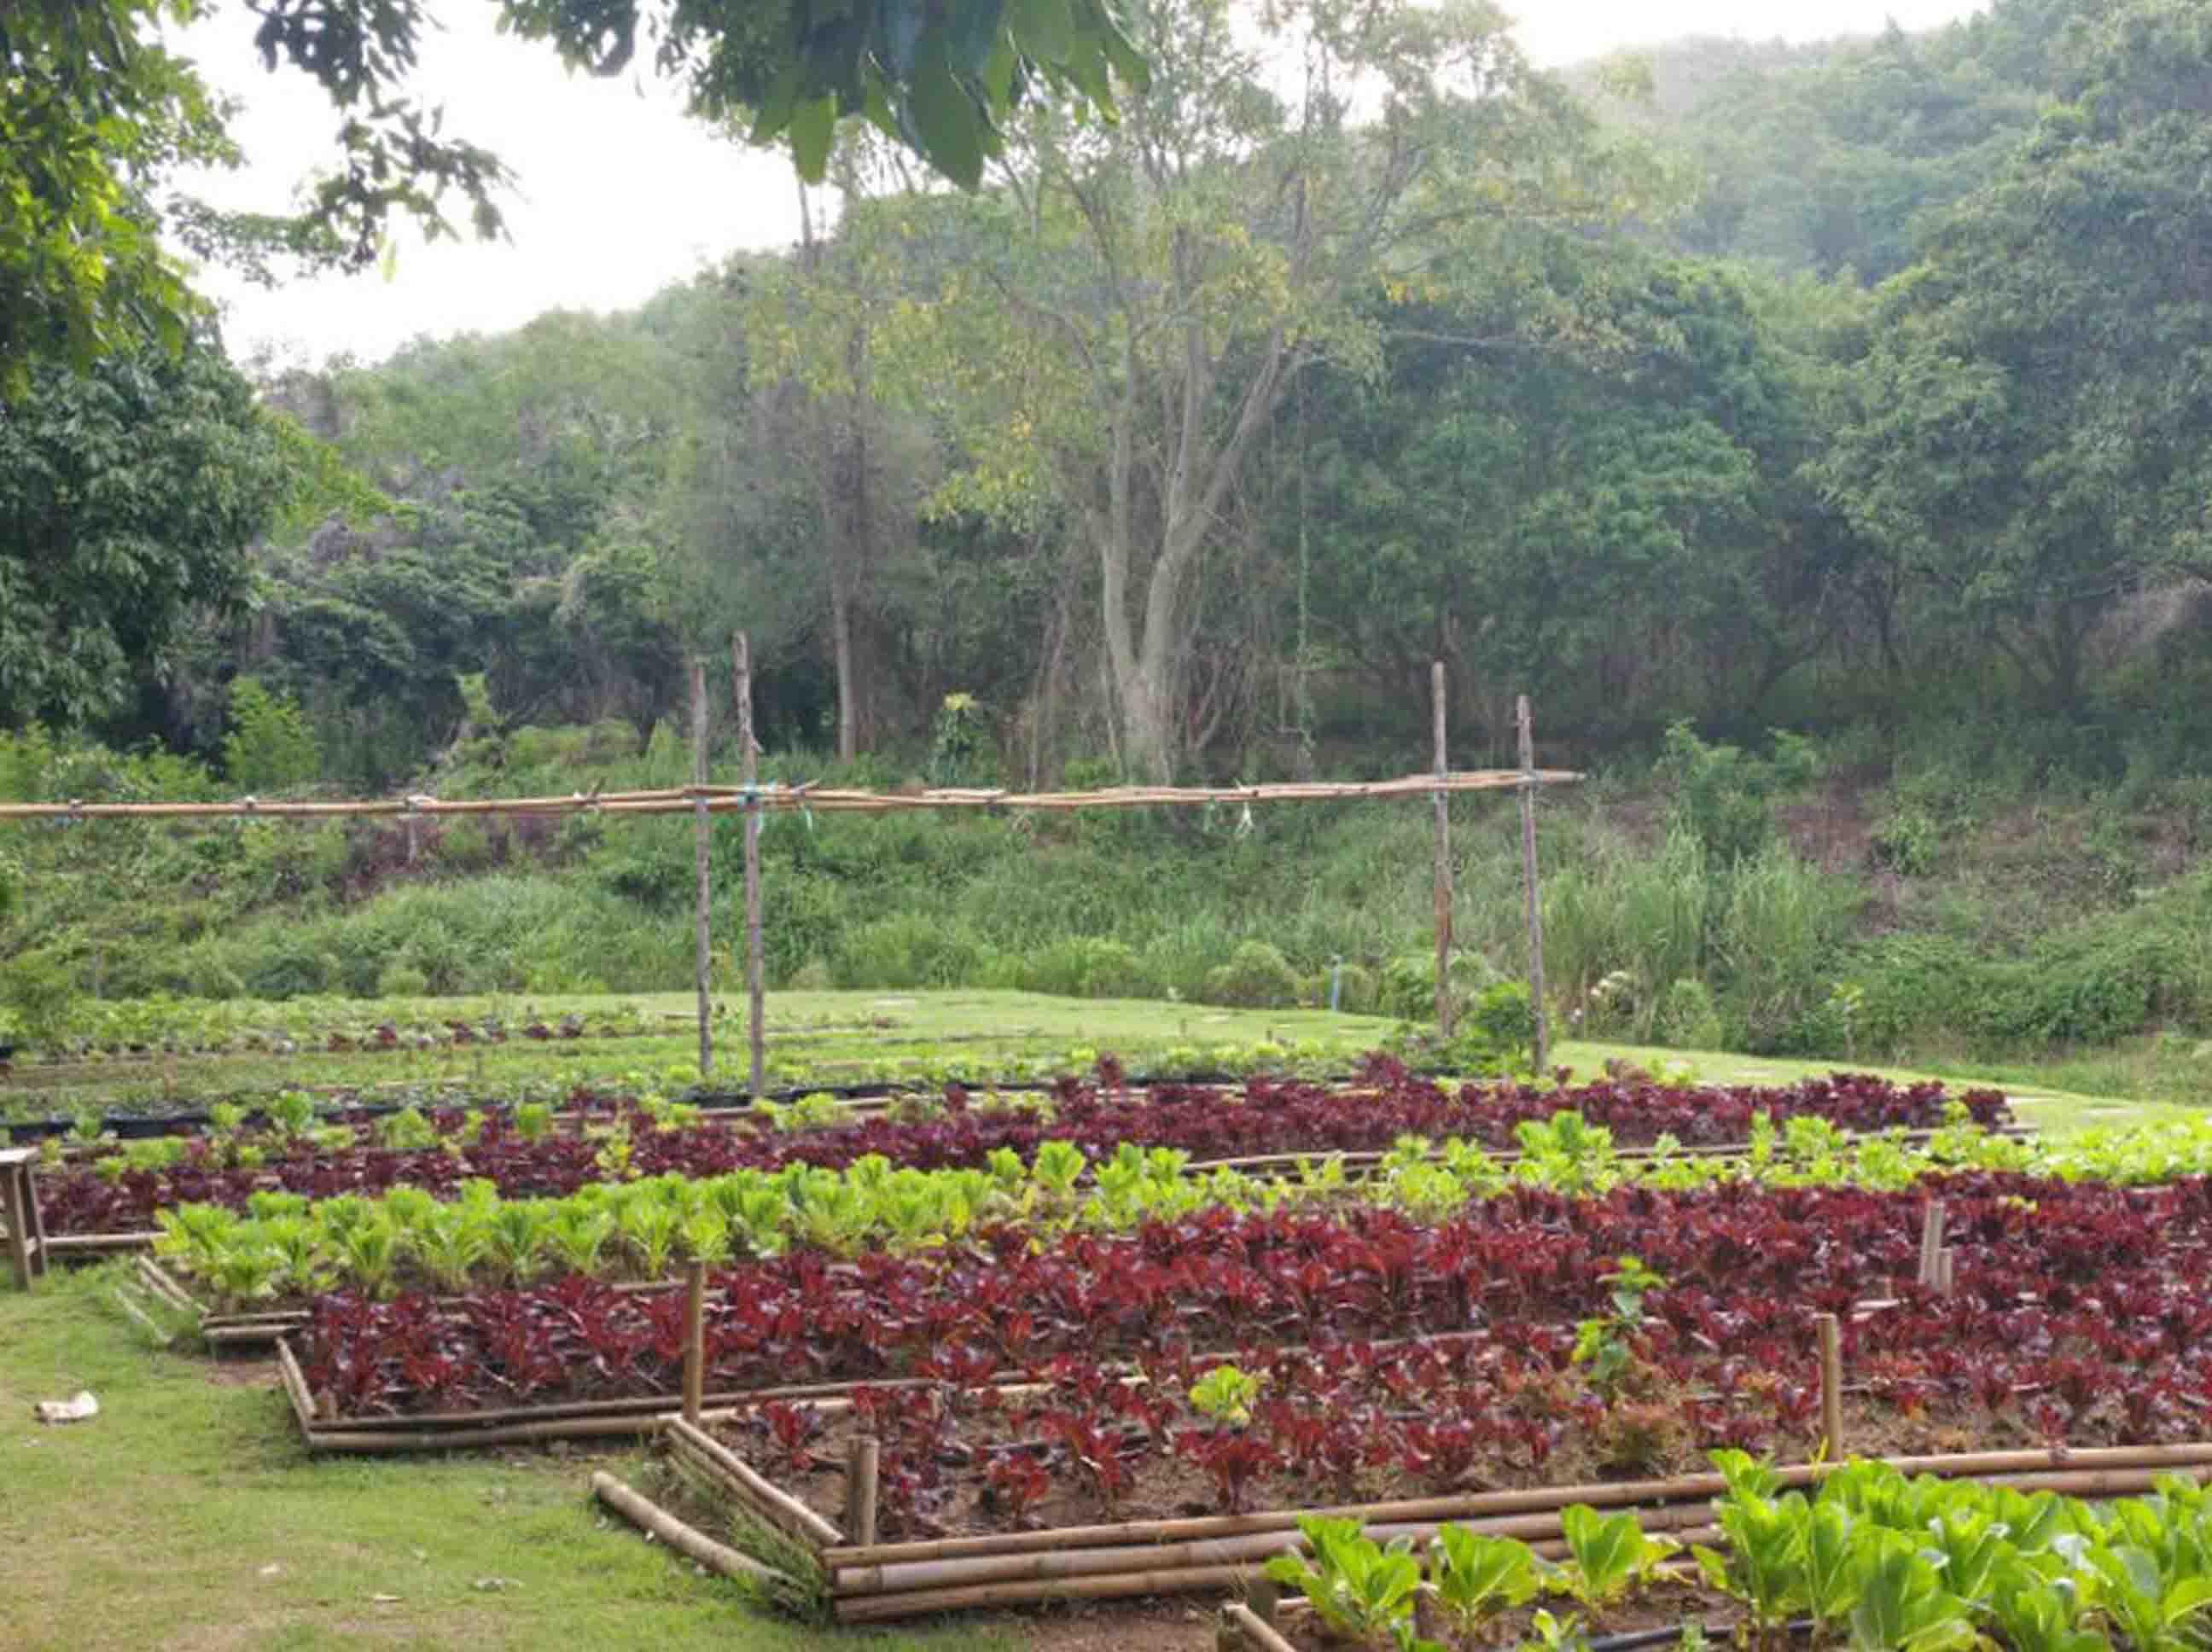 Chiang Mai Farm Stay